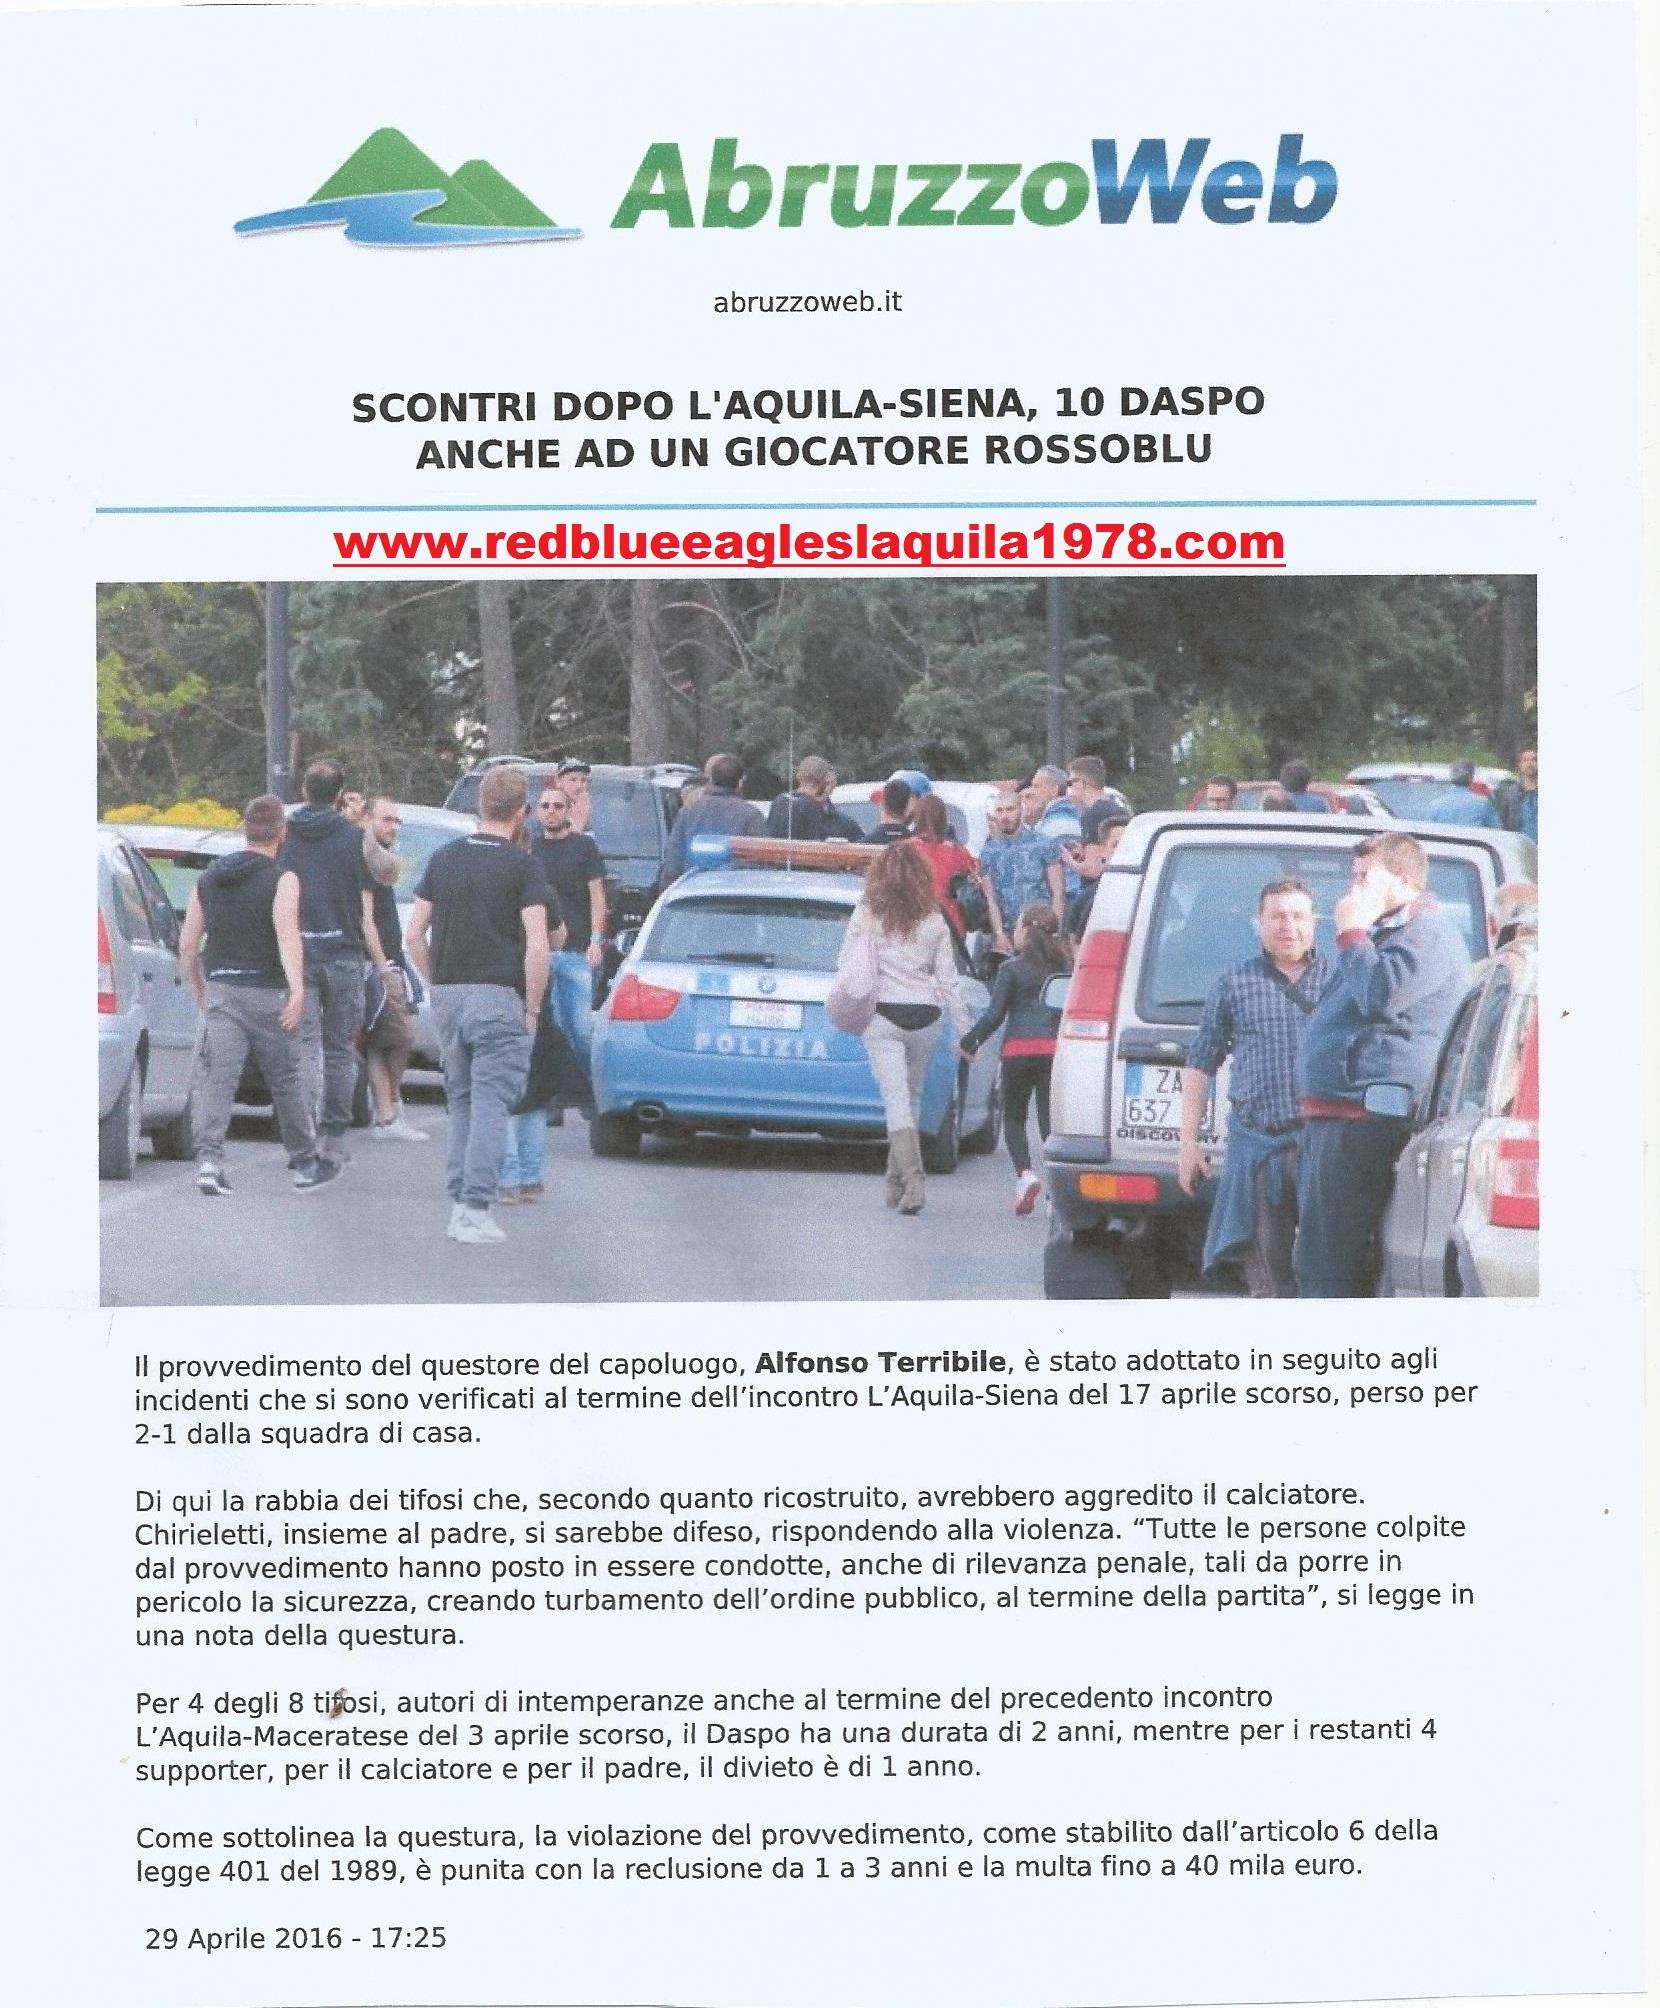 Disordini L'Aquila-Siena (lega pro) 17 Aprile 2016